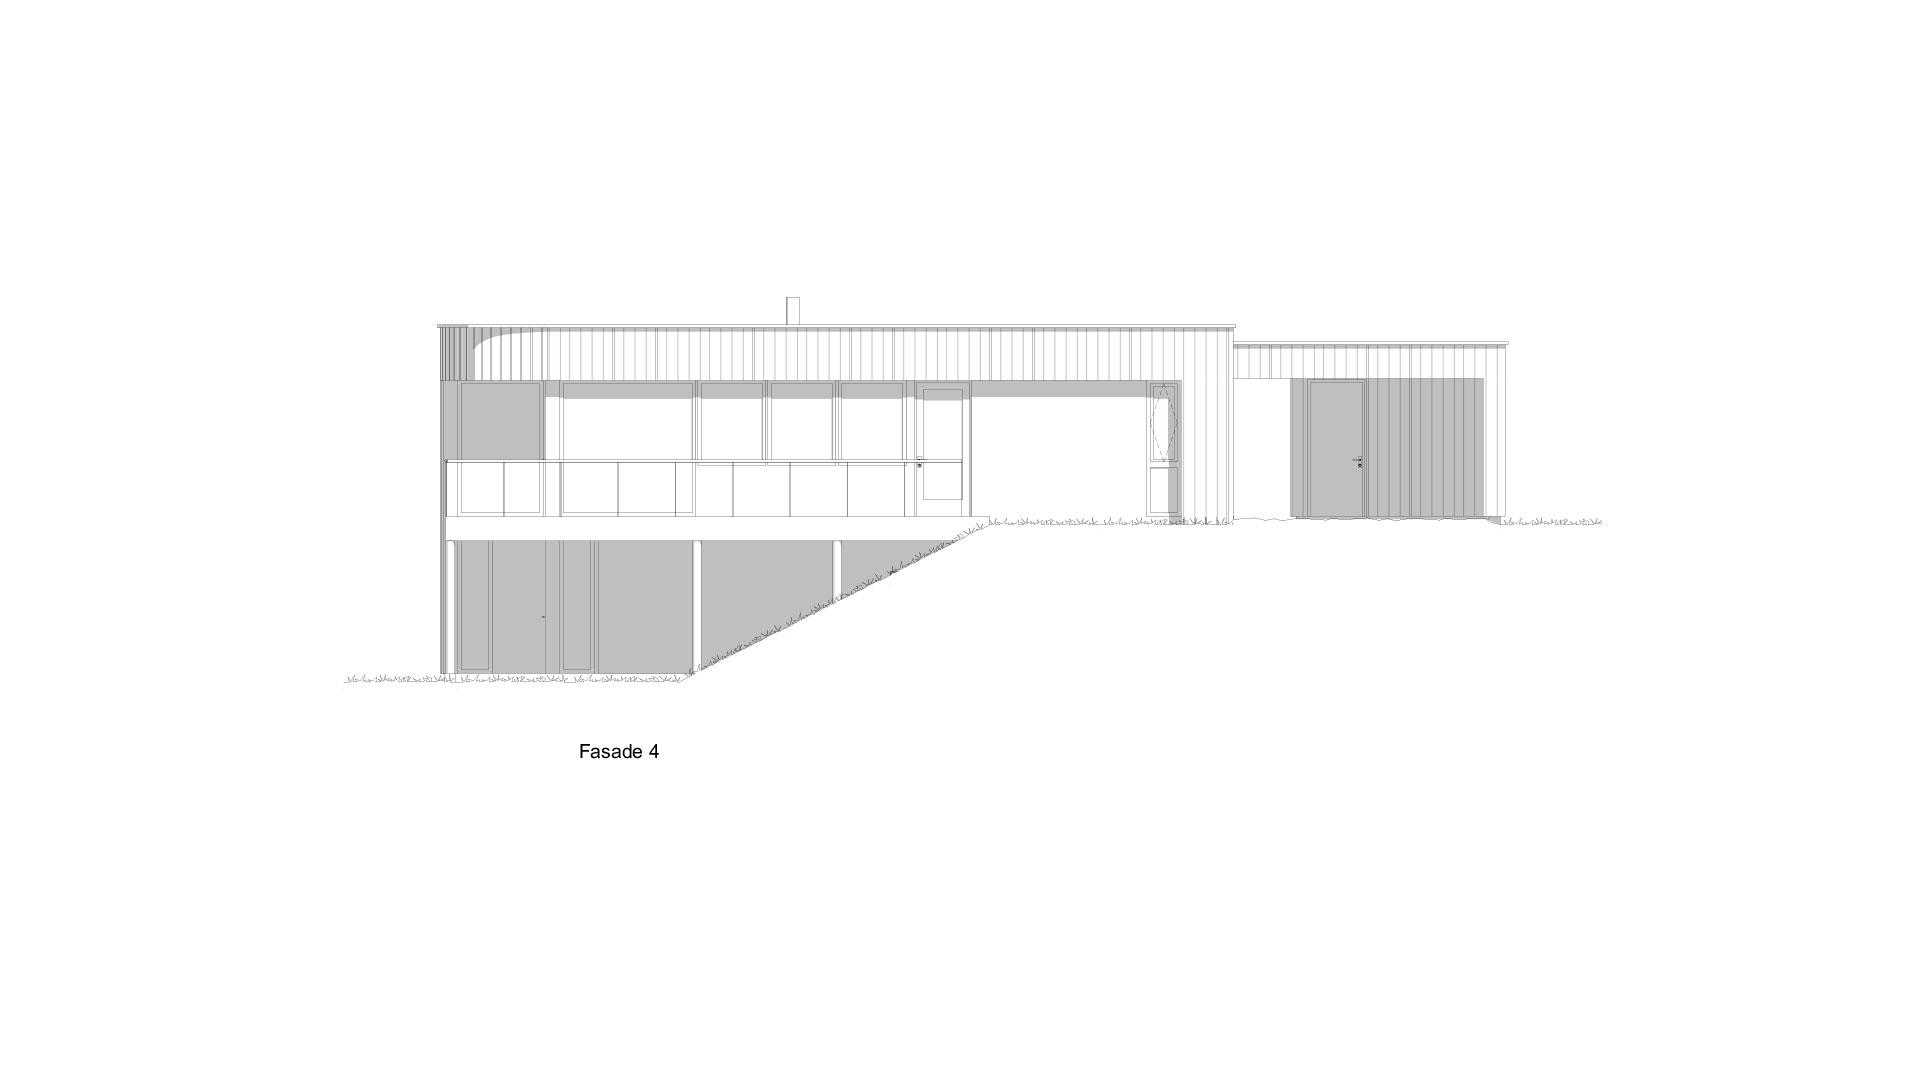 Panorama_Fasade4.jpg